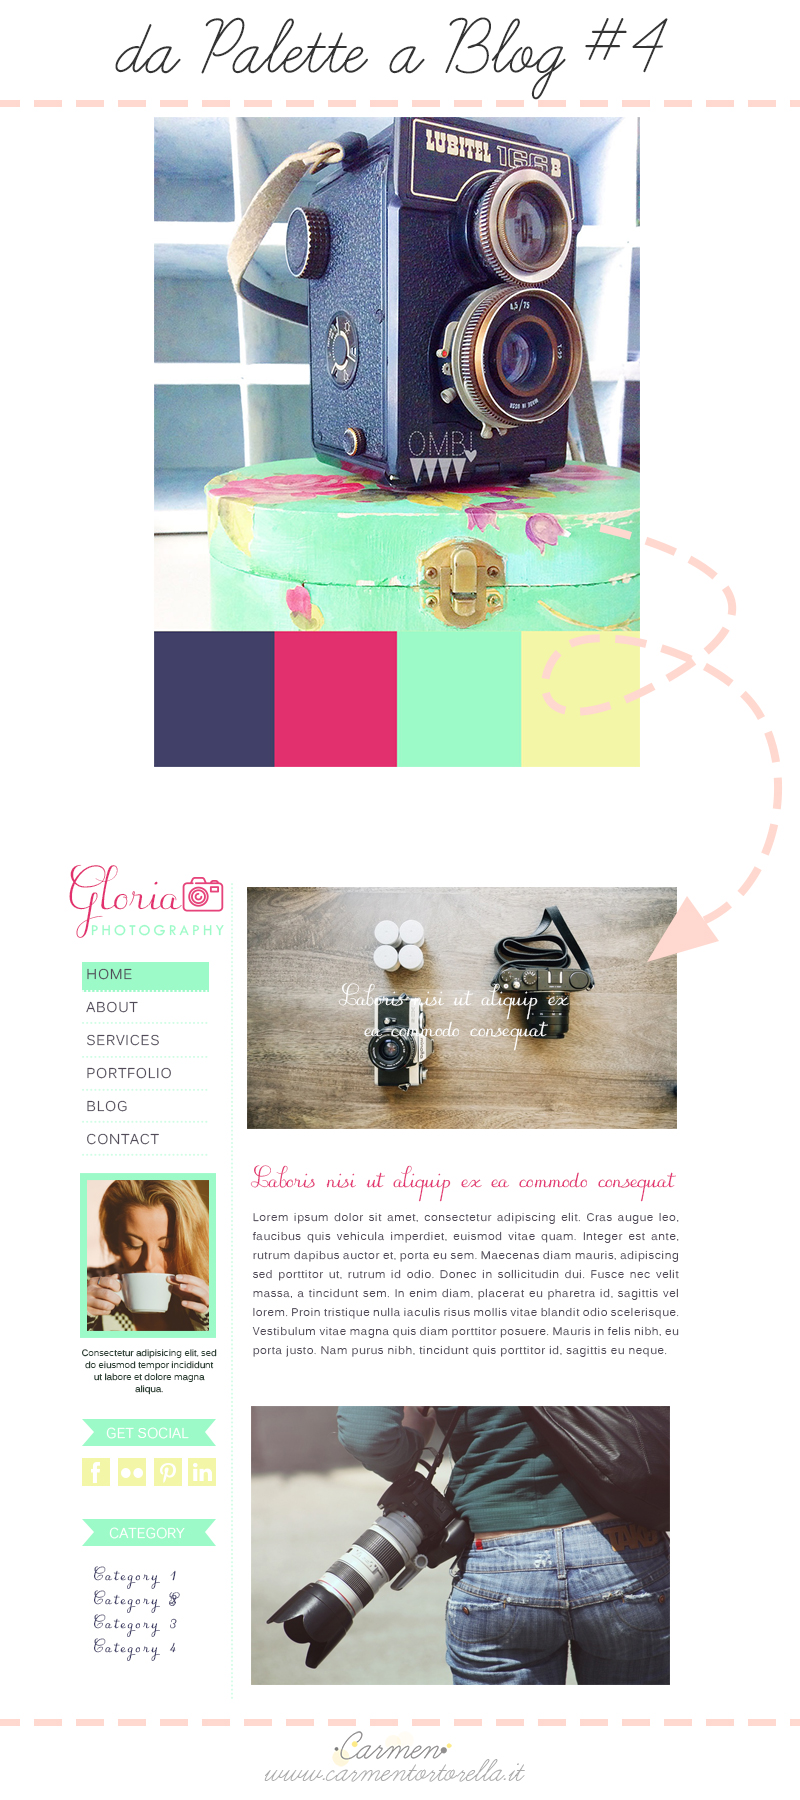 Da Palette a Blog design #4